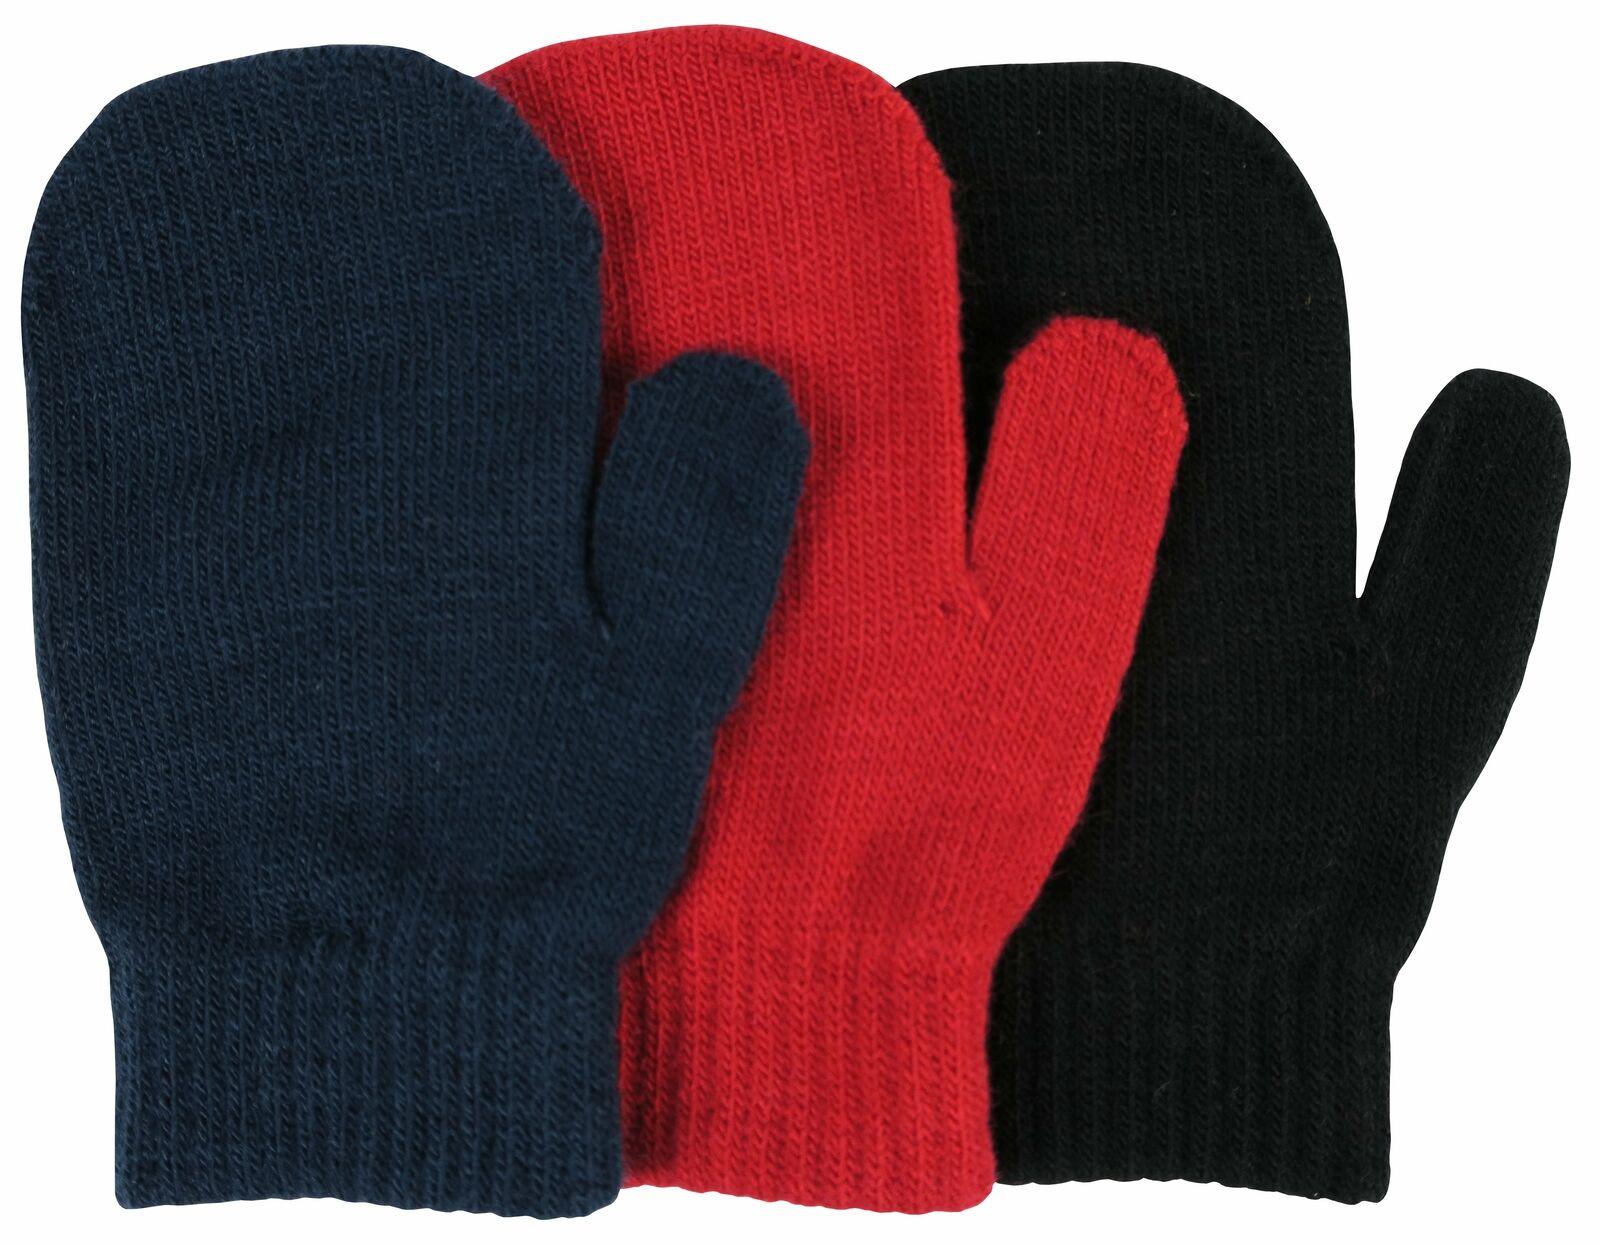 NIce Caps Boys Girls Magic Stretch Gloves 3 Pair Pack Assortment